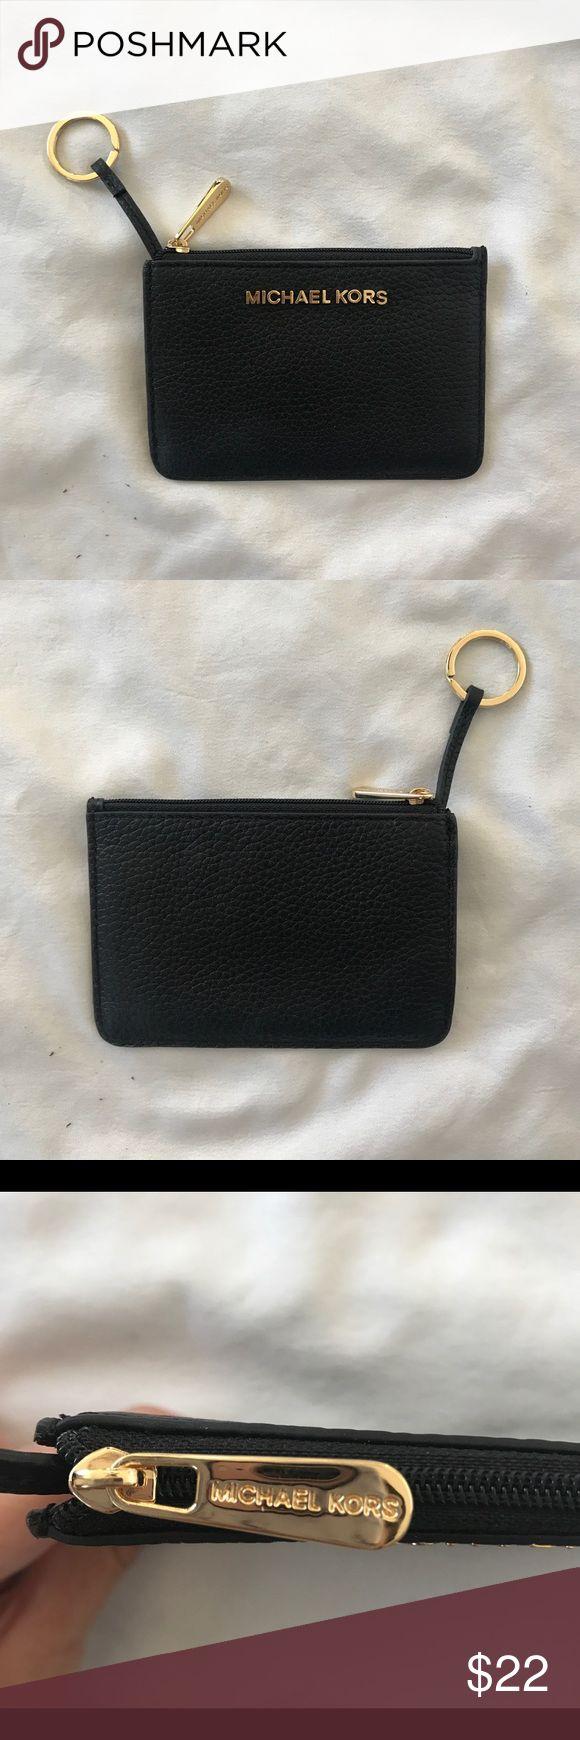 Michael Kors Coin Purse Beautiful black leather coin purse in amazing condition! Michael Kors Bags Wallets